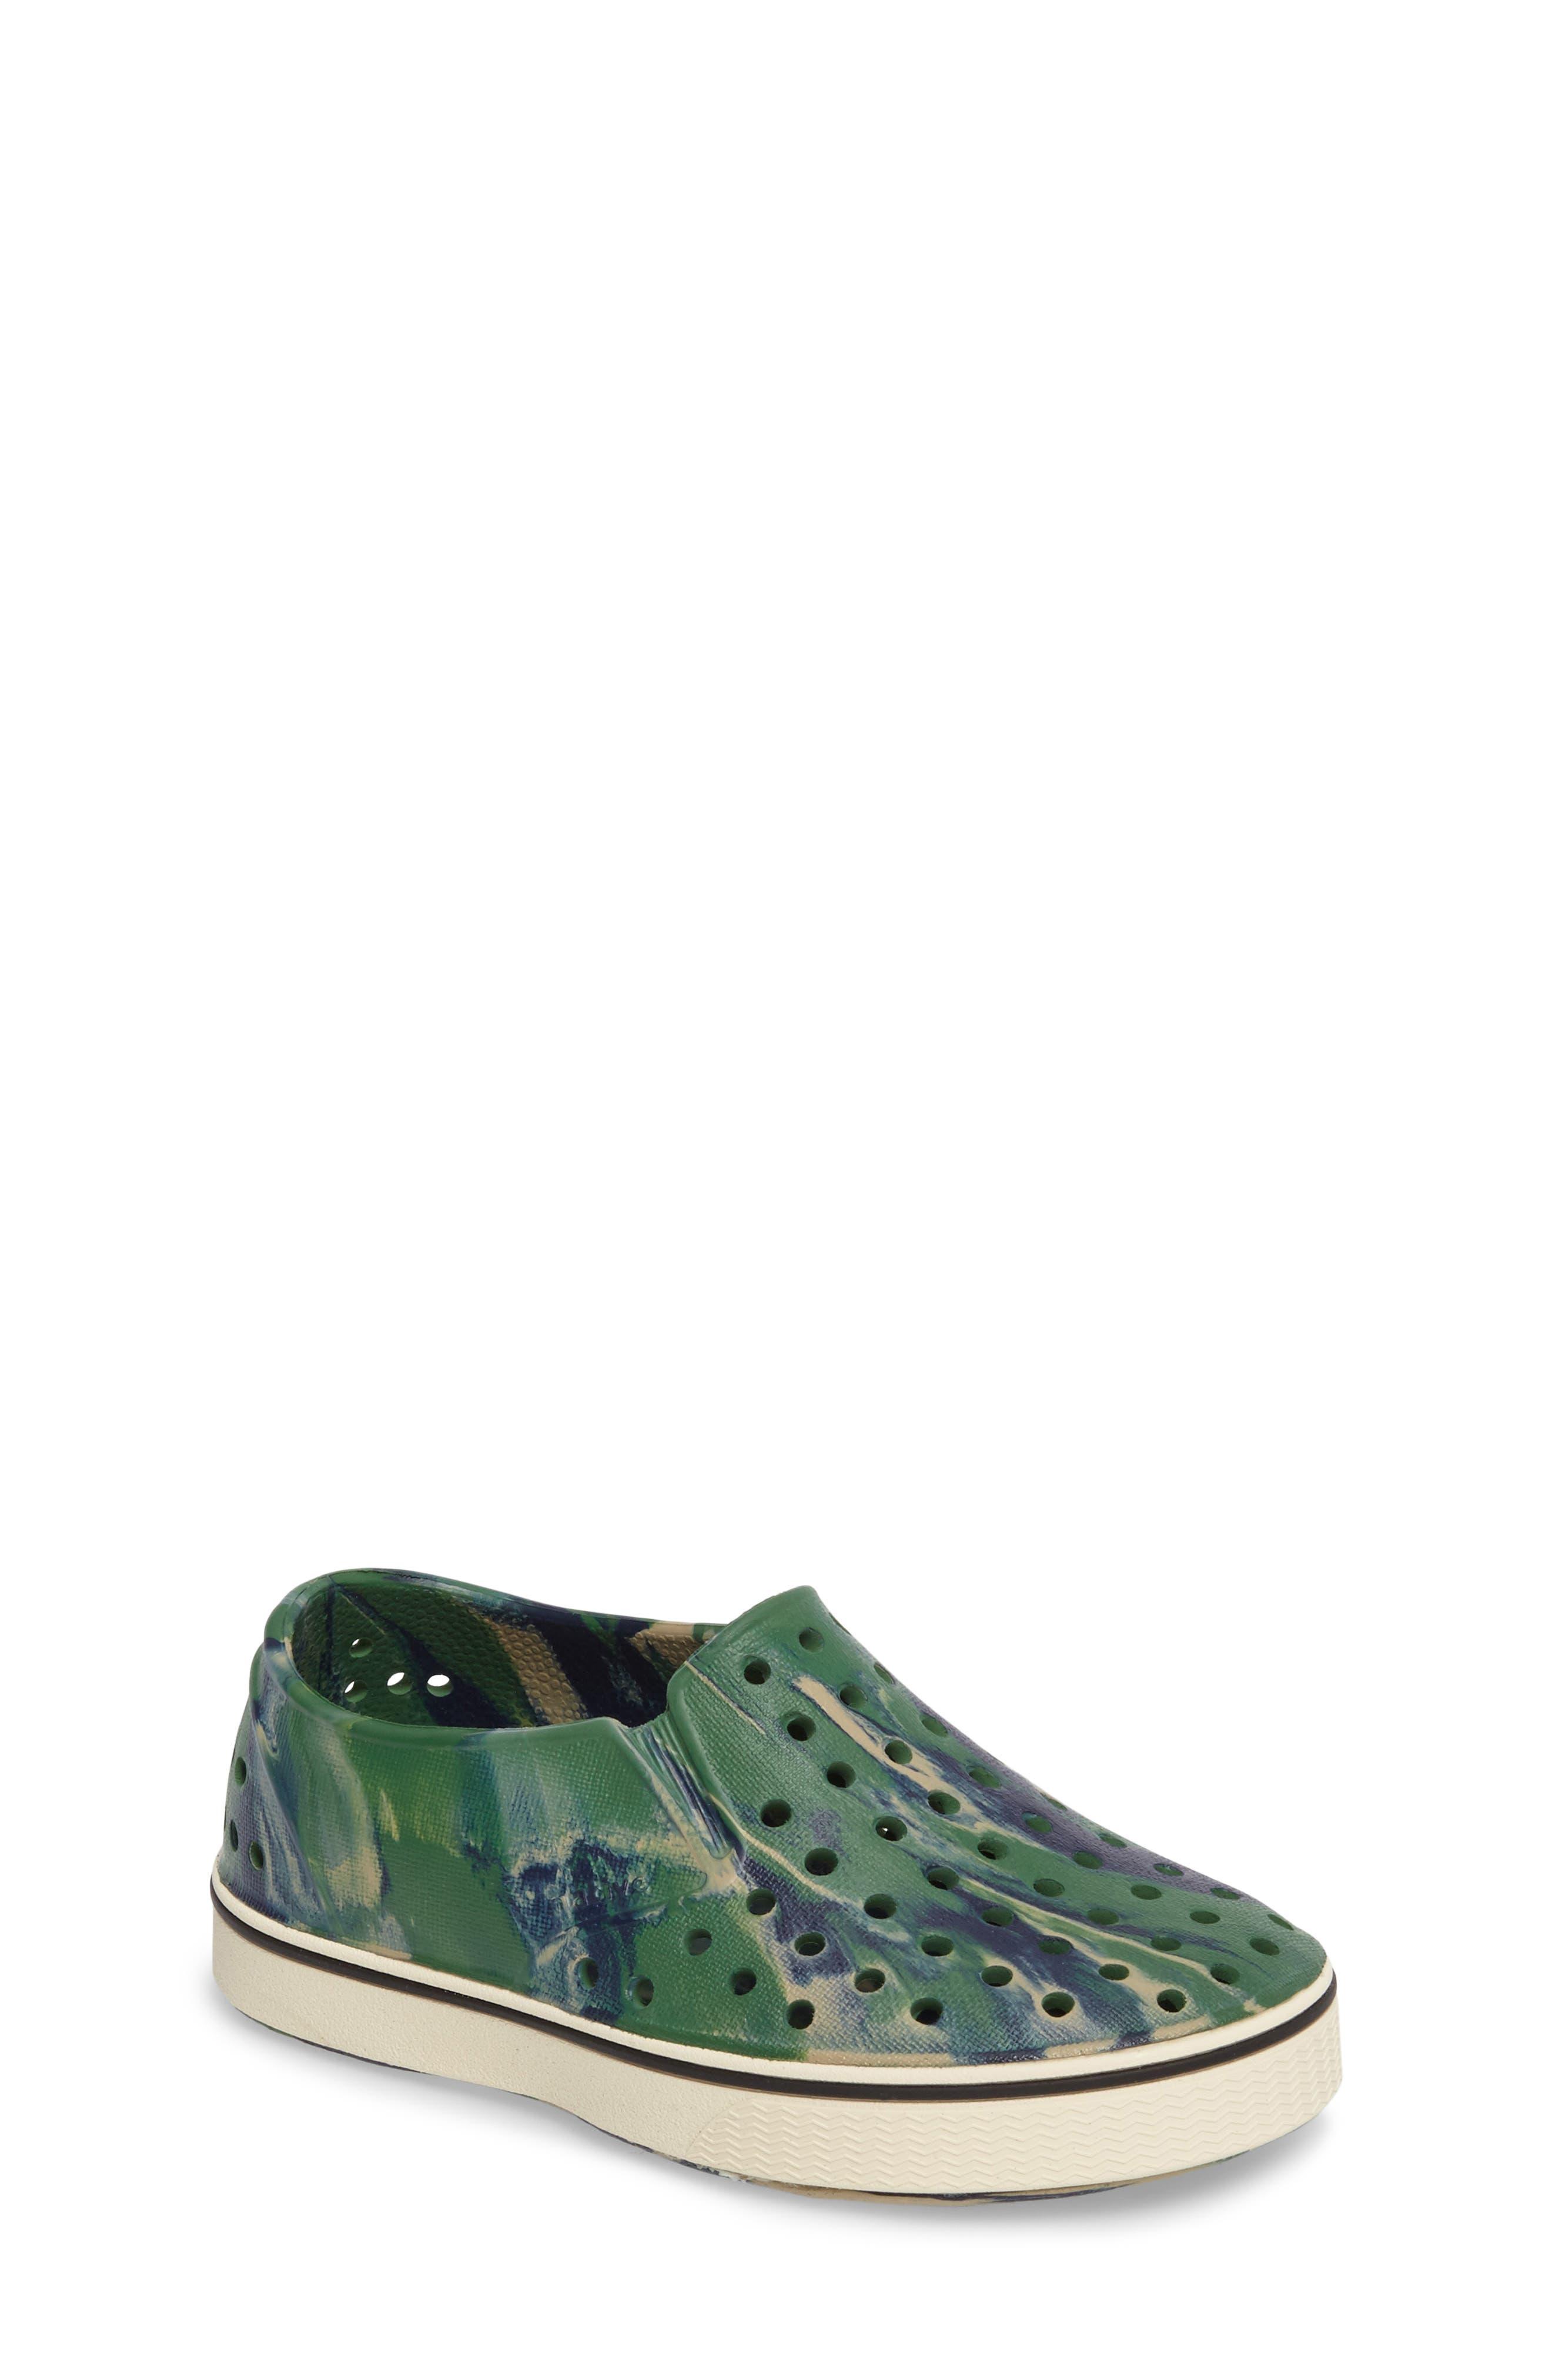 Native Shoes Miles Marbled Slip-On Sneaker (Baby, Walker, Toddler, Little Kid & Big Kid)